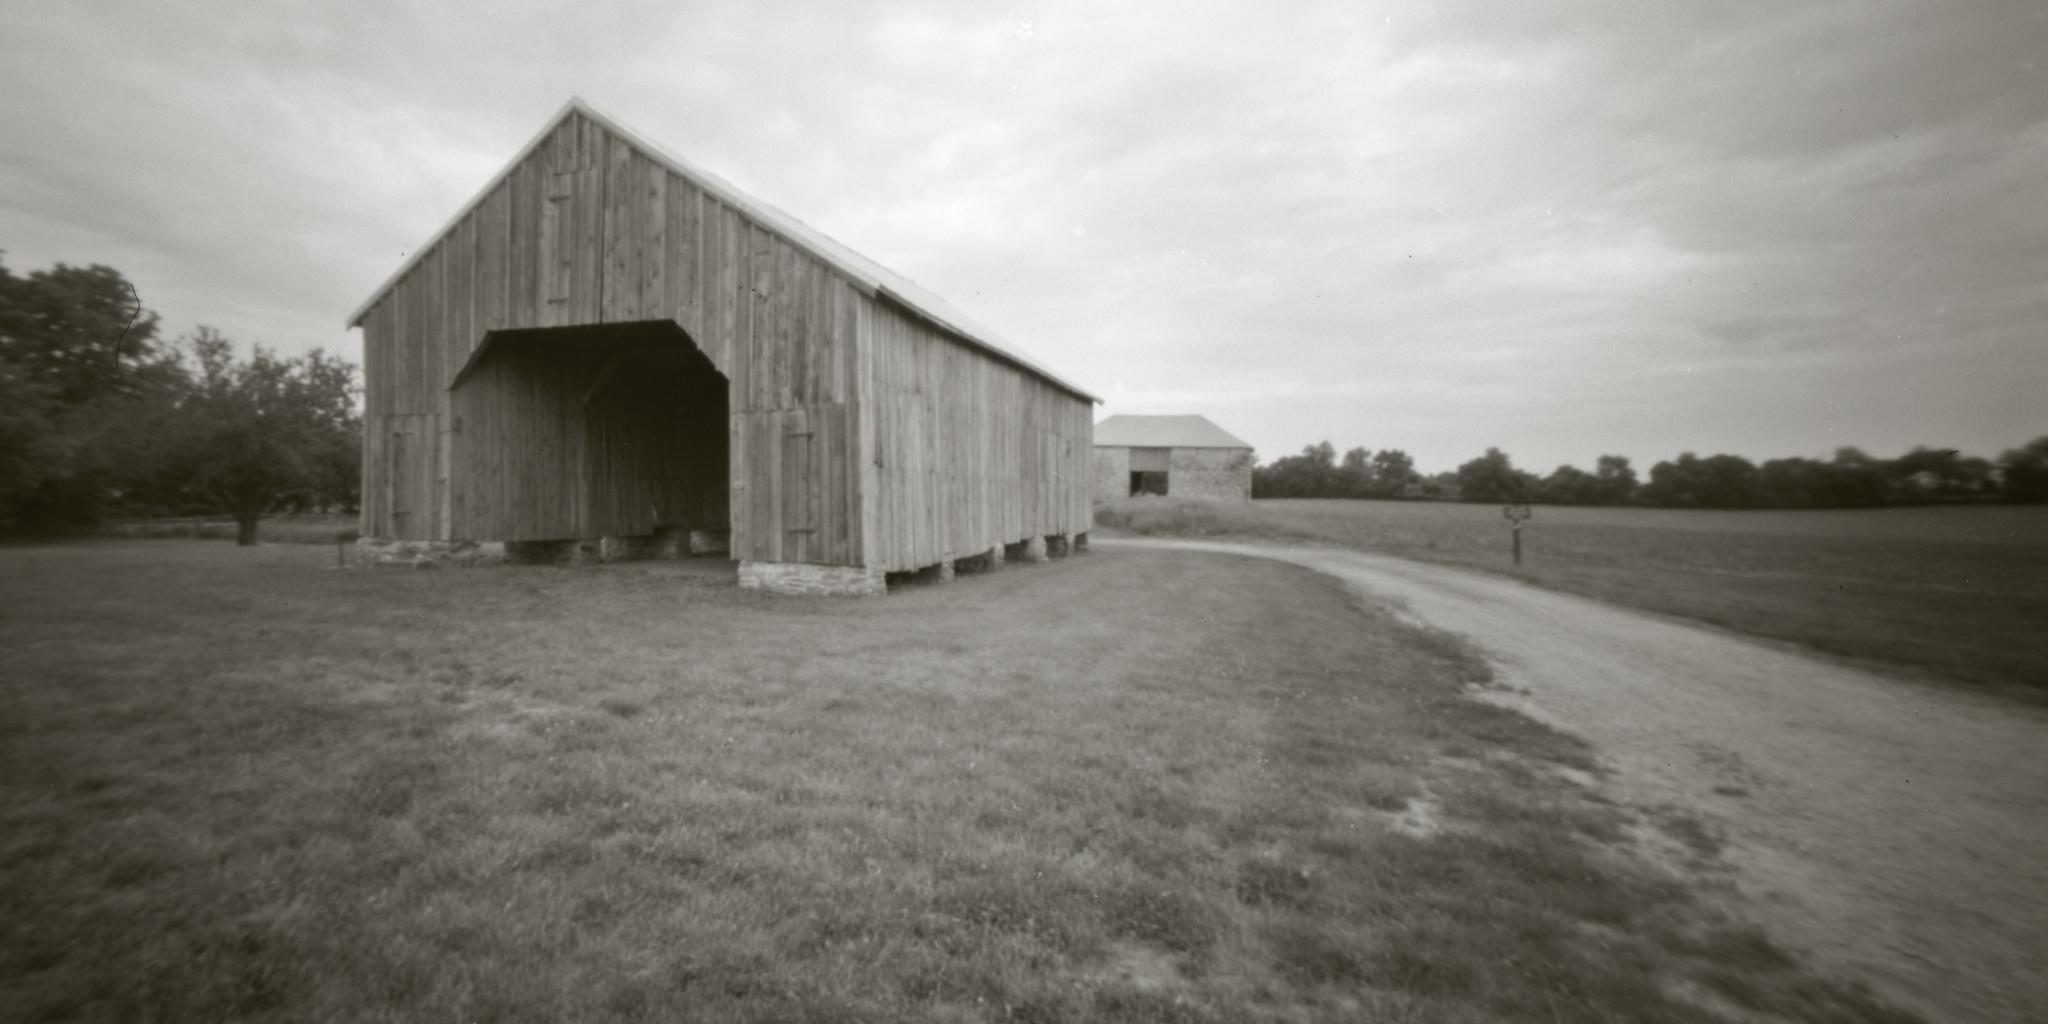 Best Farm at Monocacy National Battlefield. Frederick, Maryland. Leonardo 38mm 4x5 Pinhole camera.